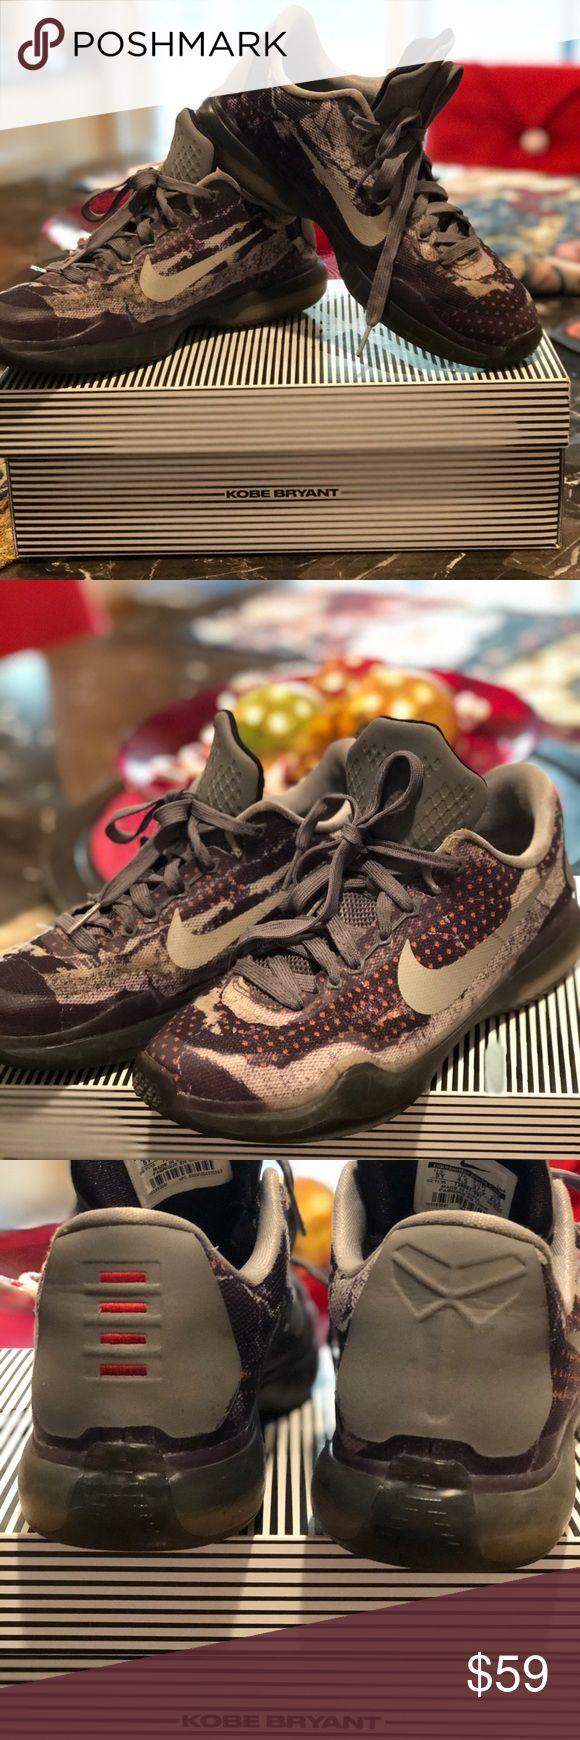 Kobe Bryant shoes Gently used Kobe shoes Nike Shoes Sneakers